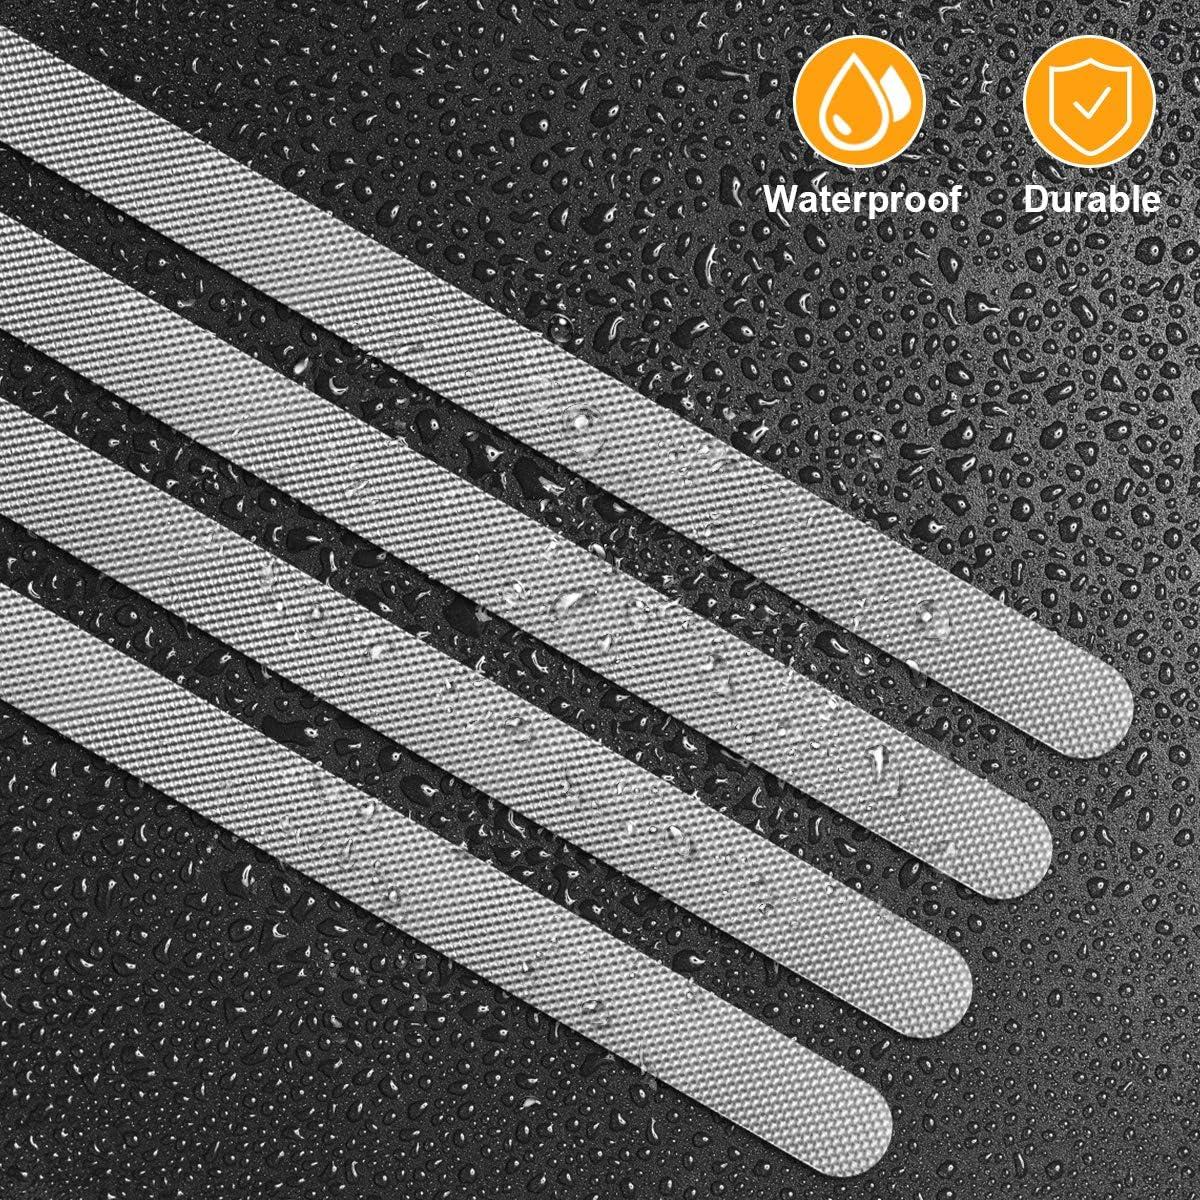 38cm 24PCS YOU Non-Slip Strip Stickers,Shower Stickers Bath Safety Strips Transparent Self-Adhesive Non Slip Strips Stickers for Bathtubs Showers,Stair,2cm